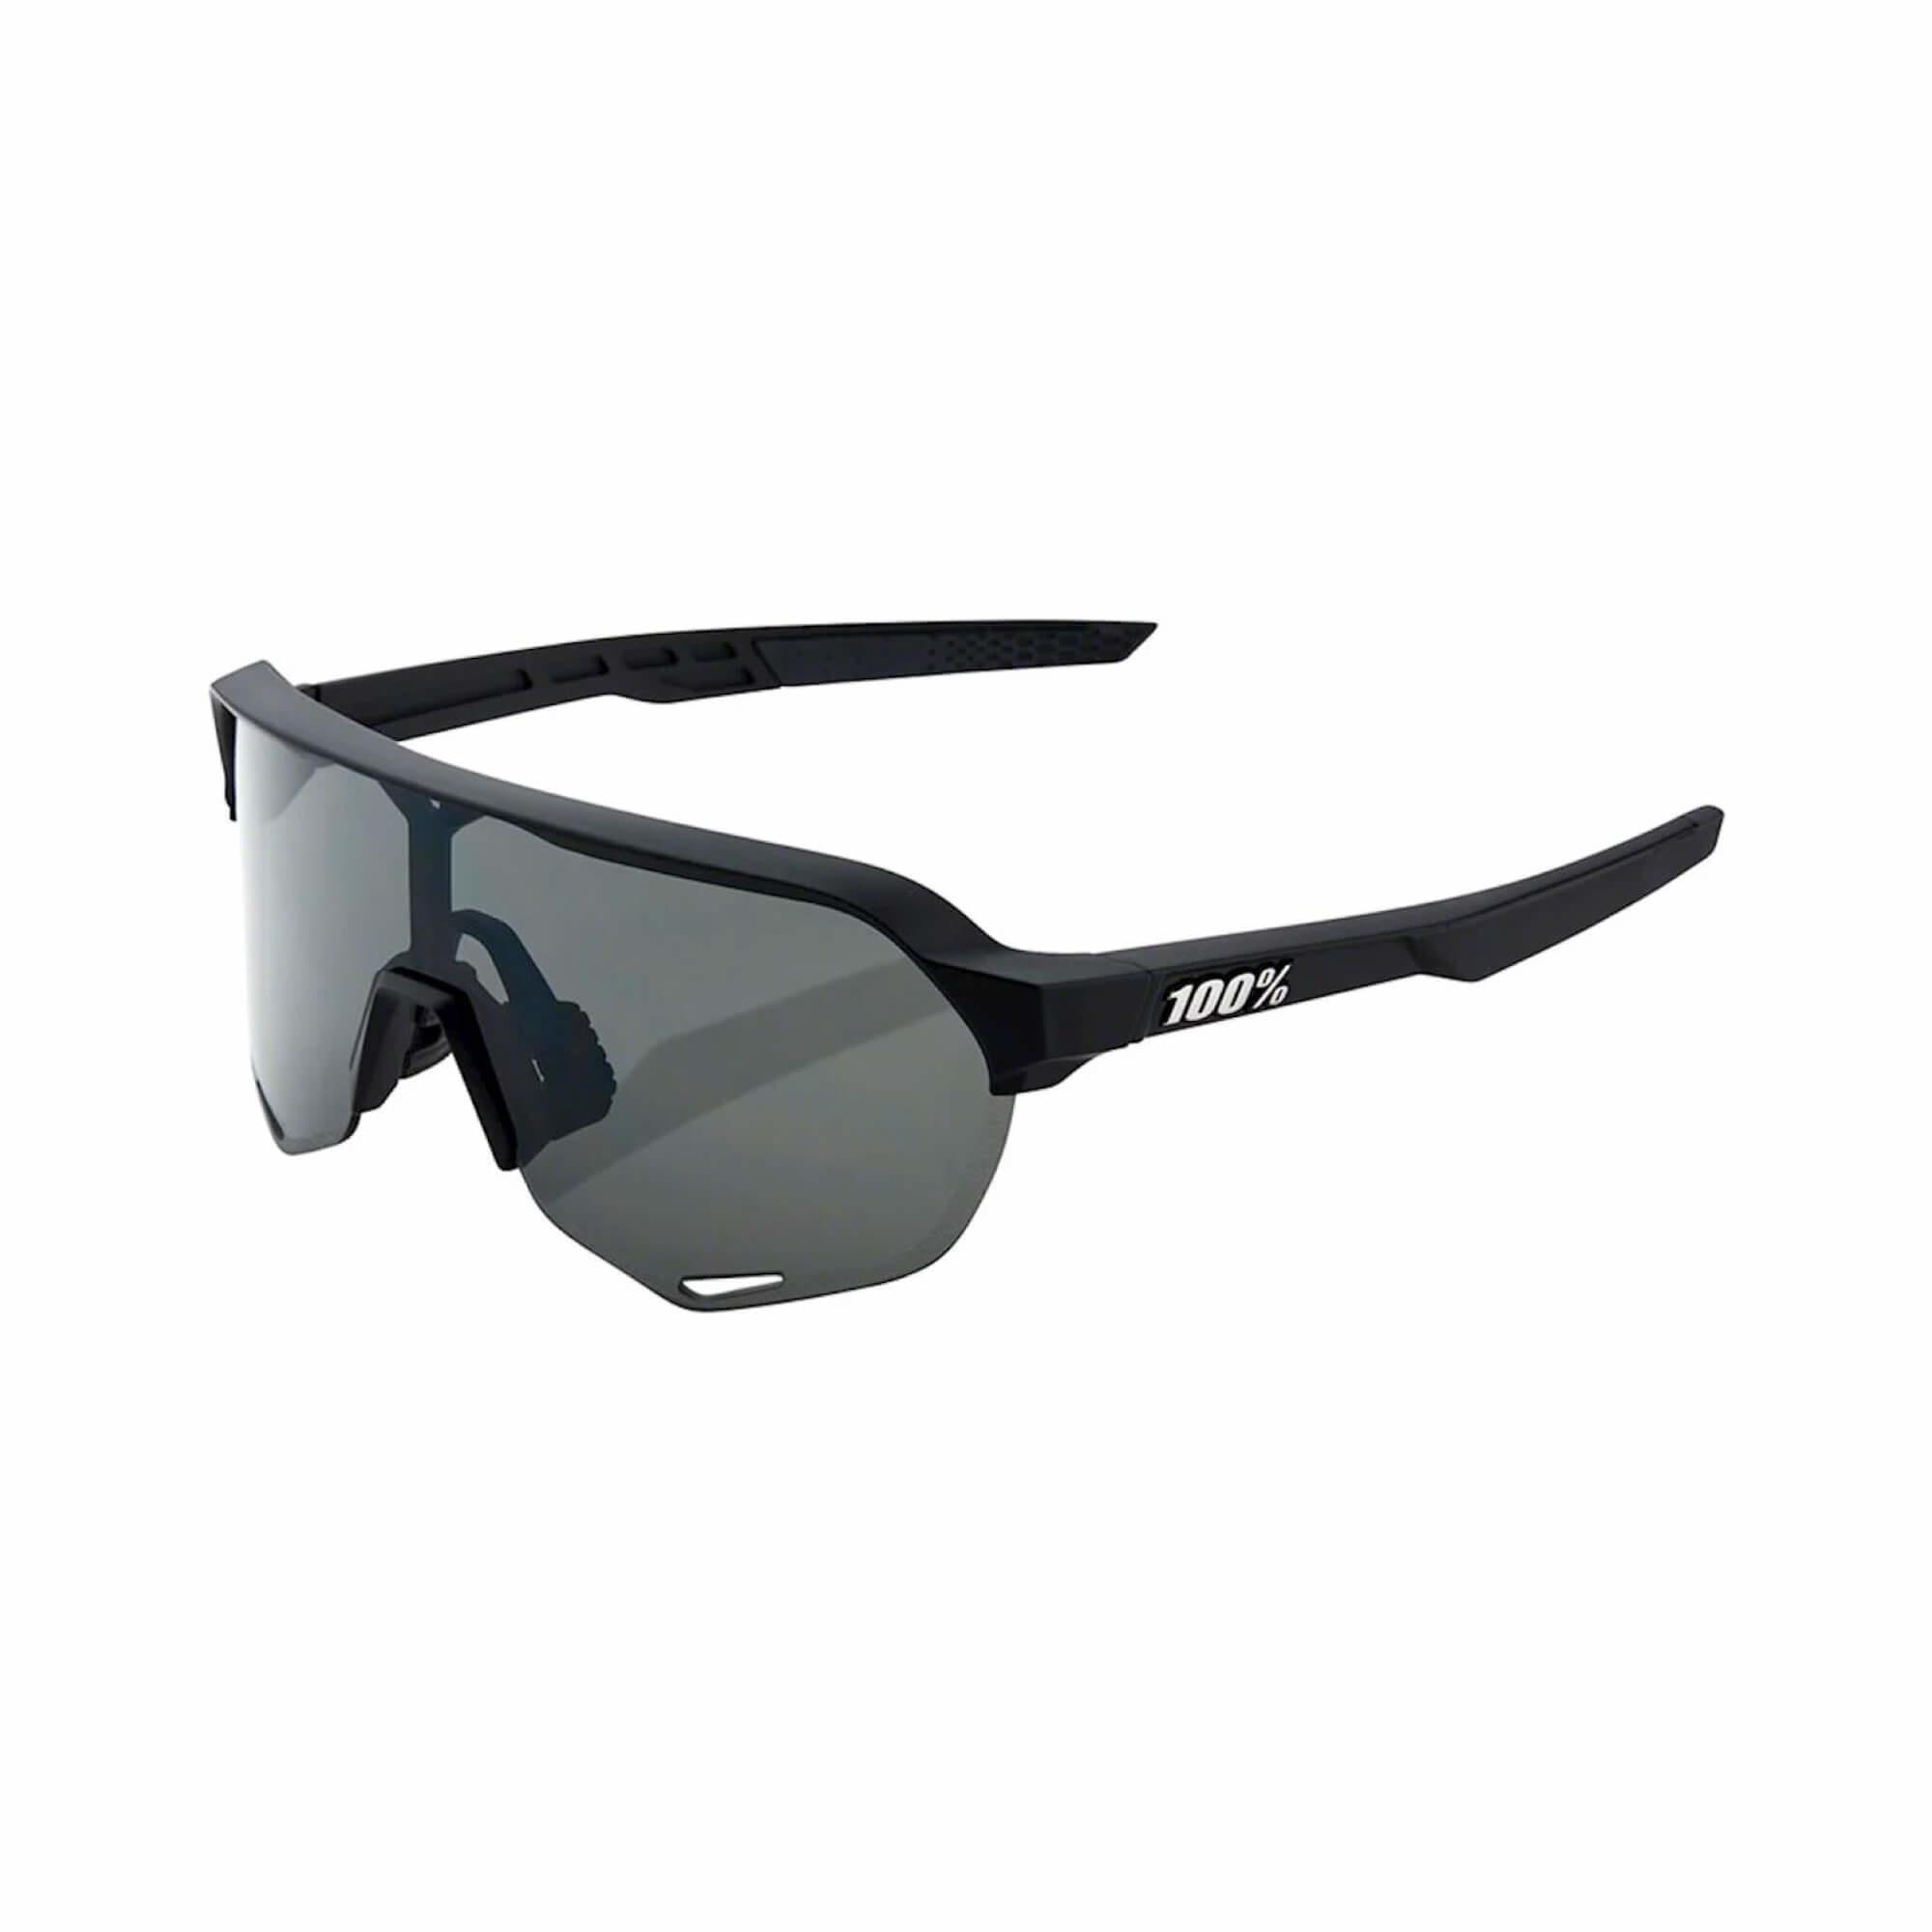 S2 Soft Tact Black Smoke Lens-1